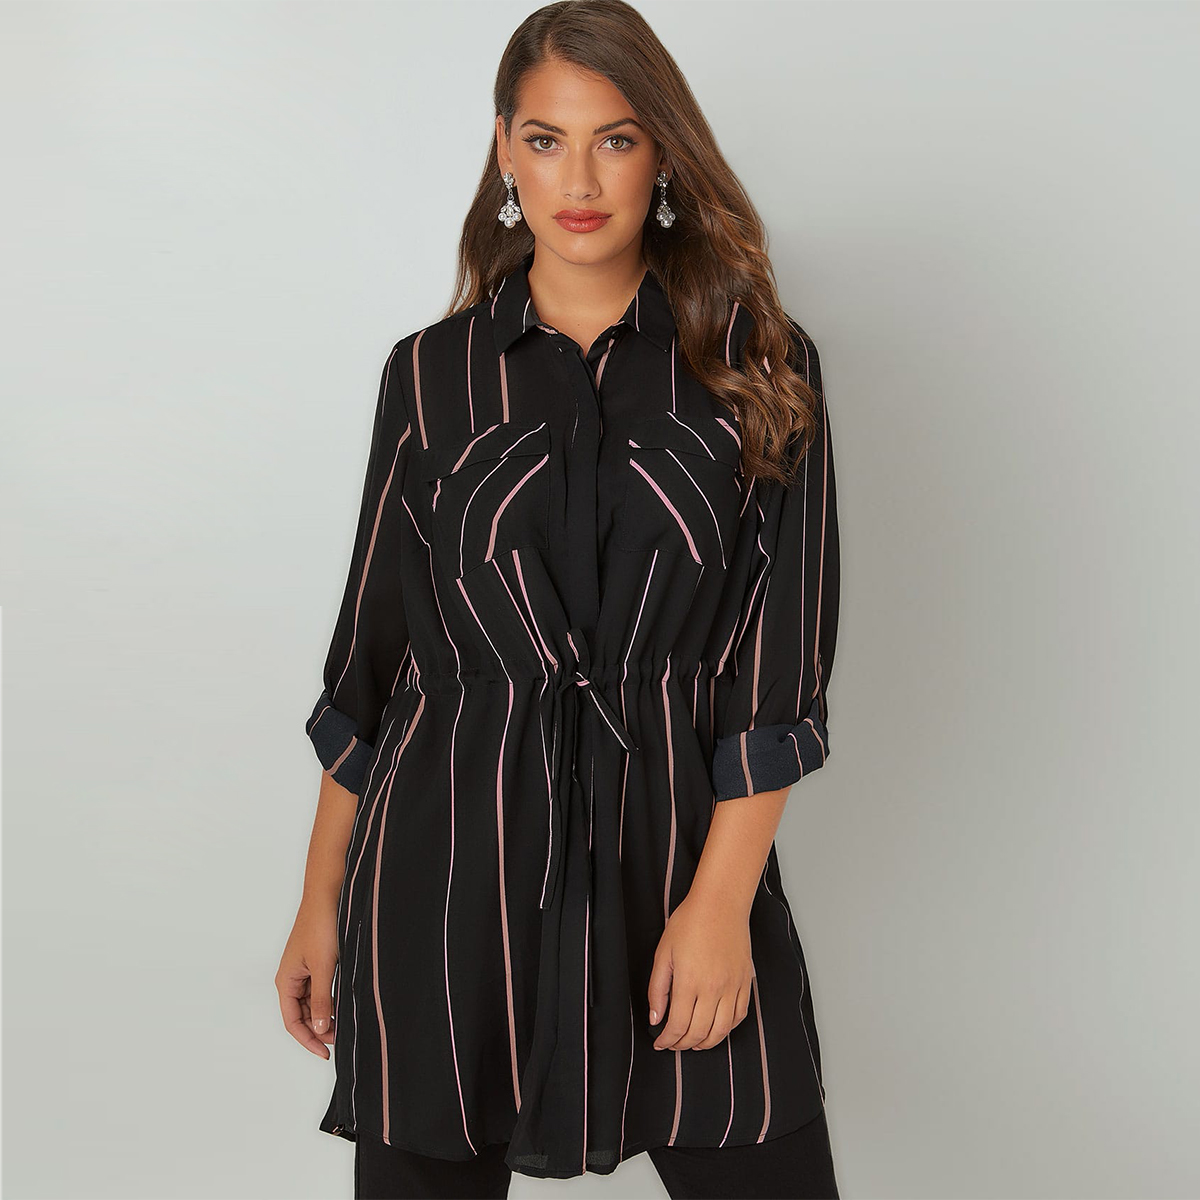 MCO 2018 Spring Simple Tie Waist Plus Size OL Stripe Shirt Casual Oversize Long Office Ladies Blouse Basic Big Women Top 6xl 7xl 1